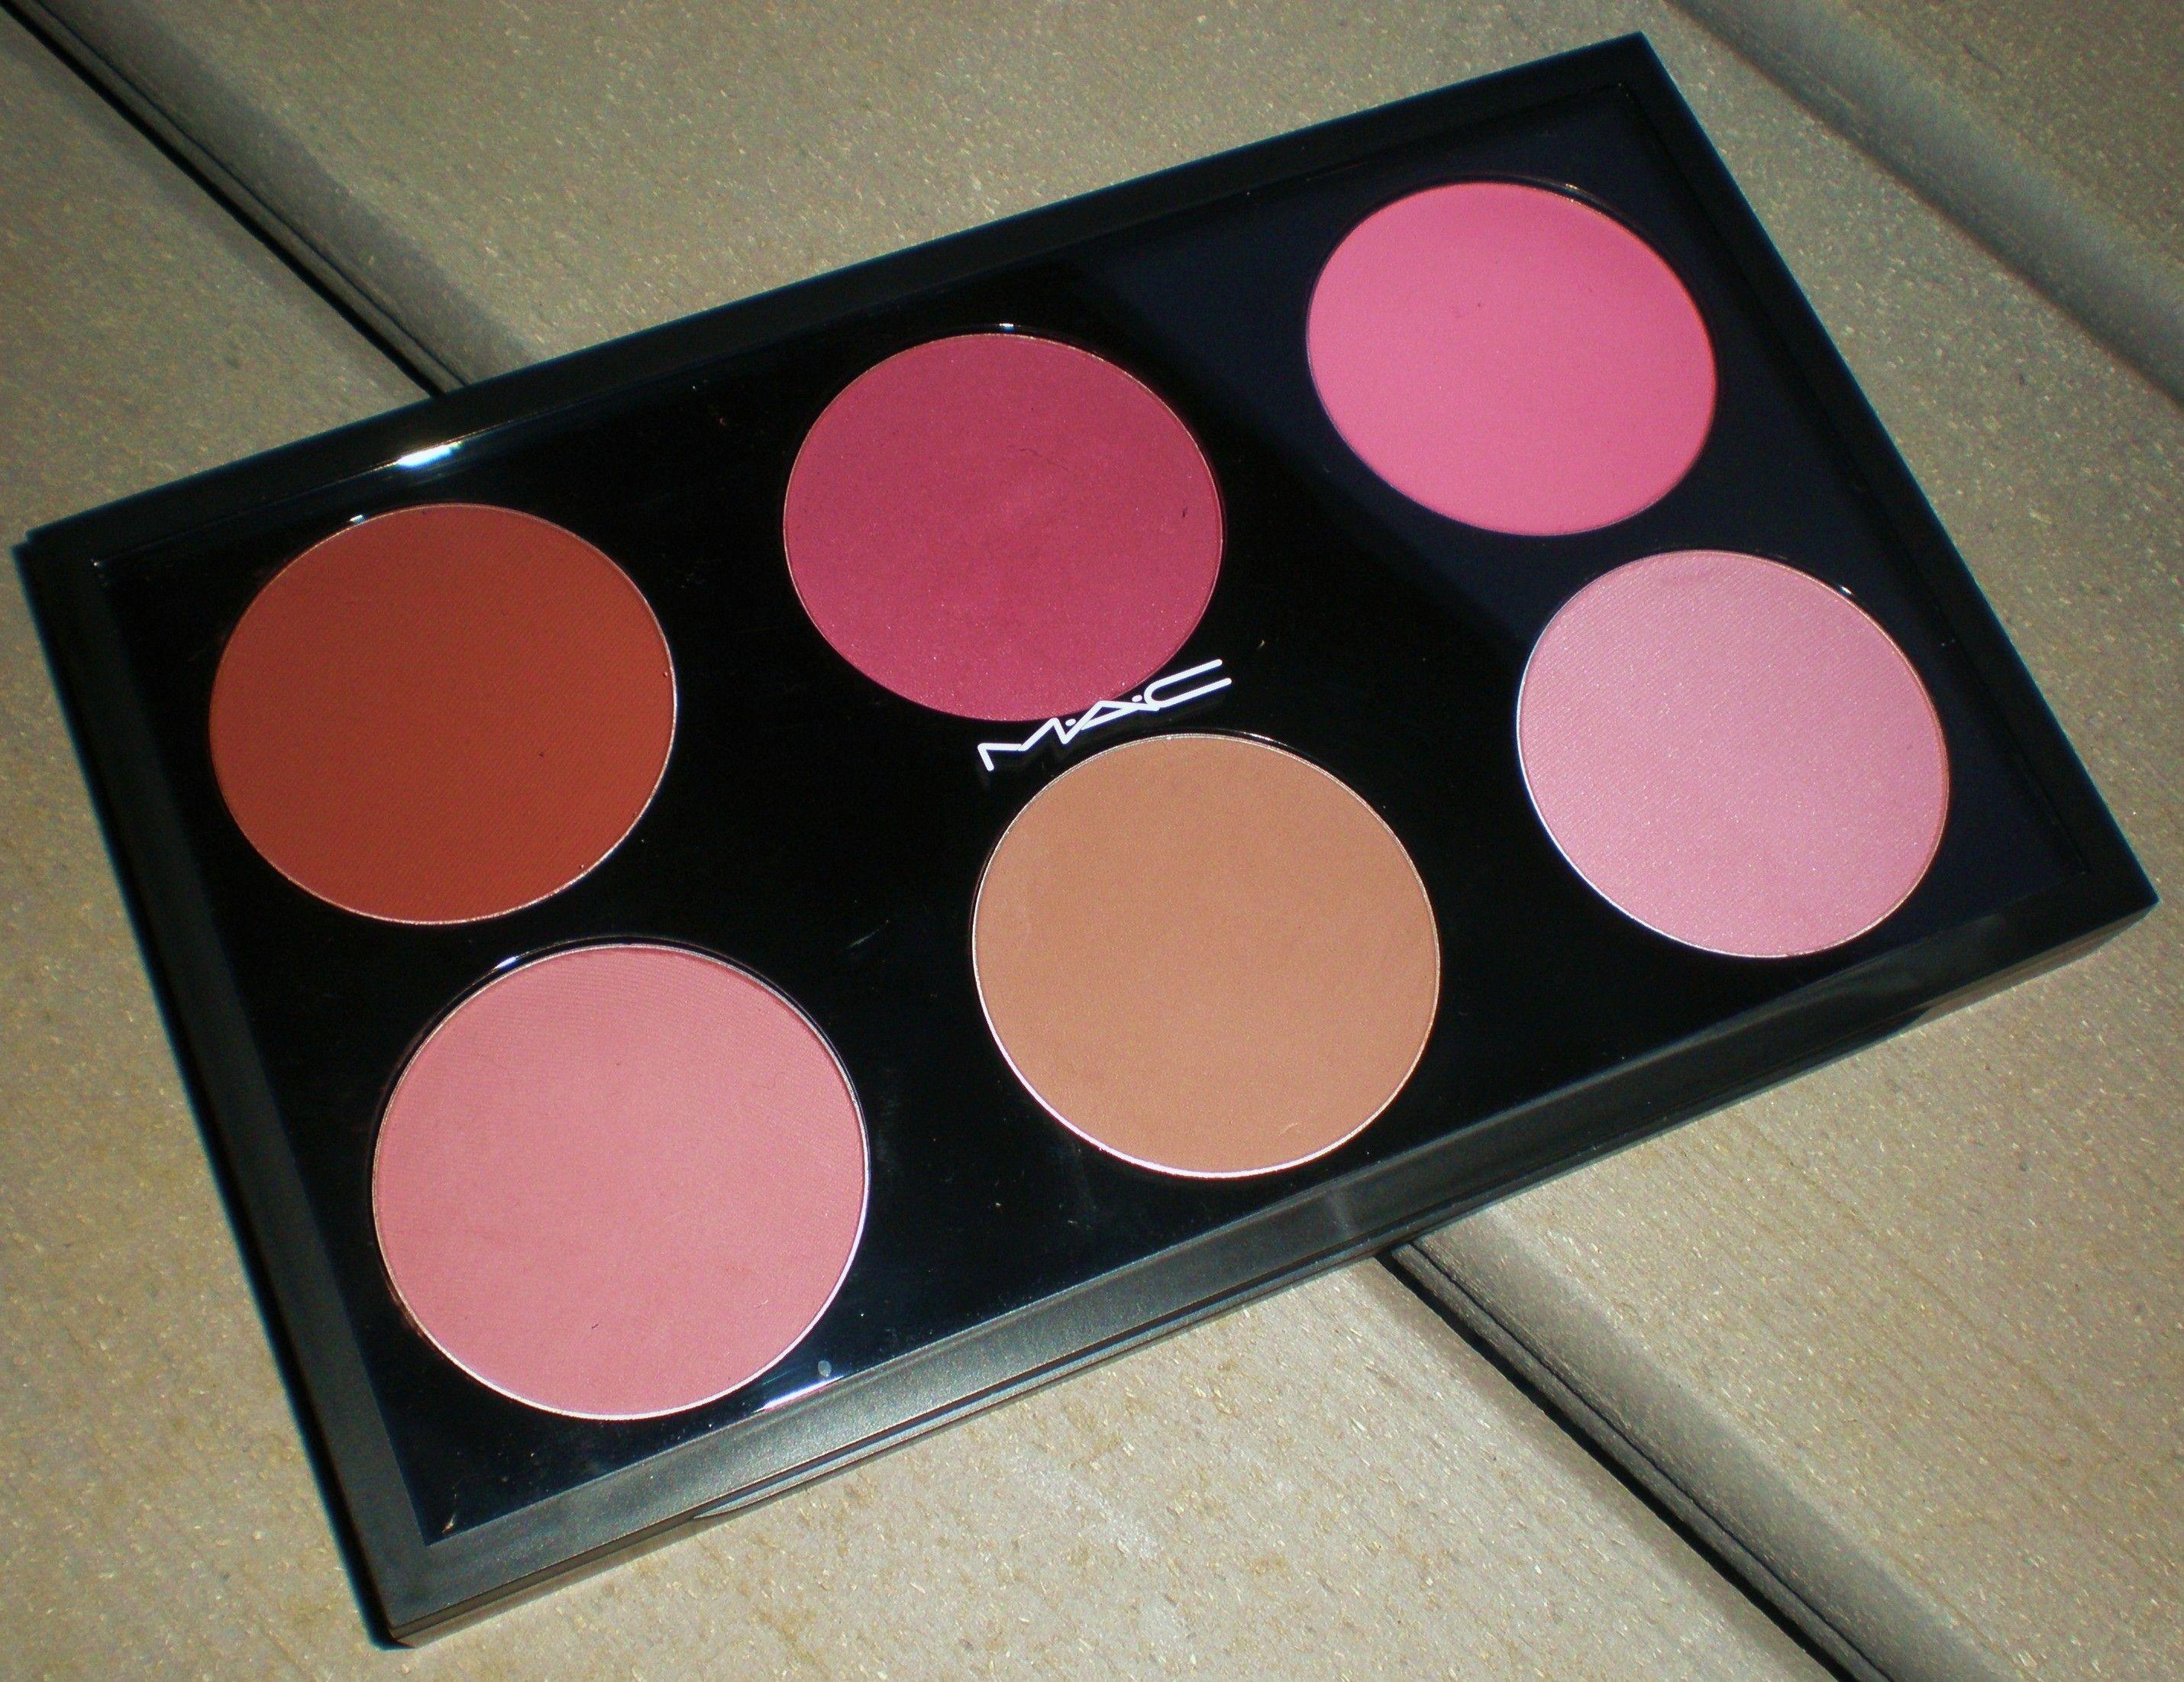 MAC Customizable Pro Palette blush (Top LR Raizin